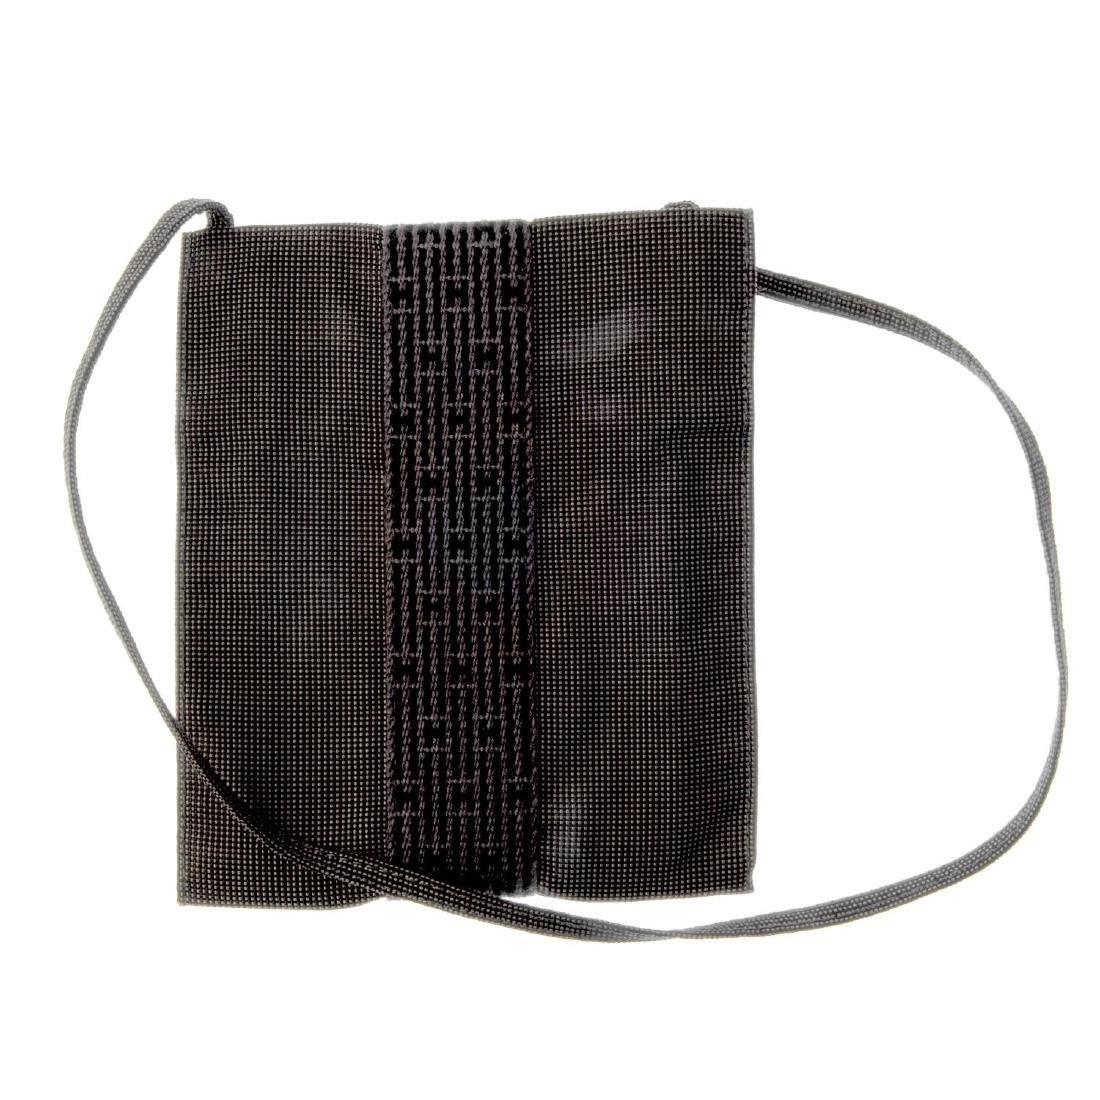 HERMÈS - a Herline Pochette handbag. The flat,